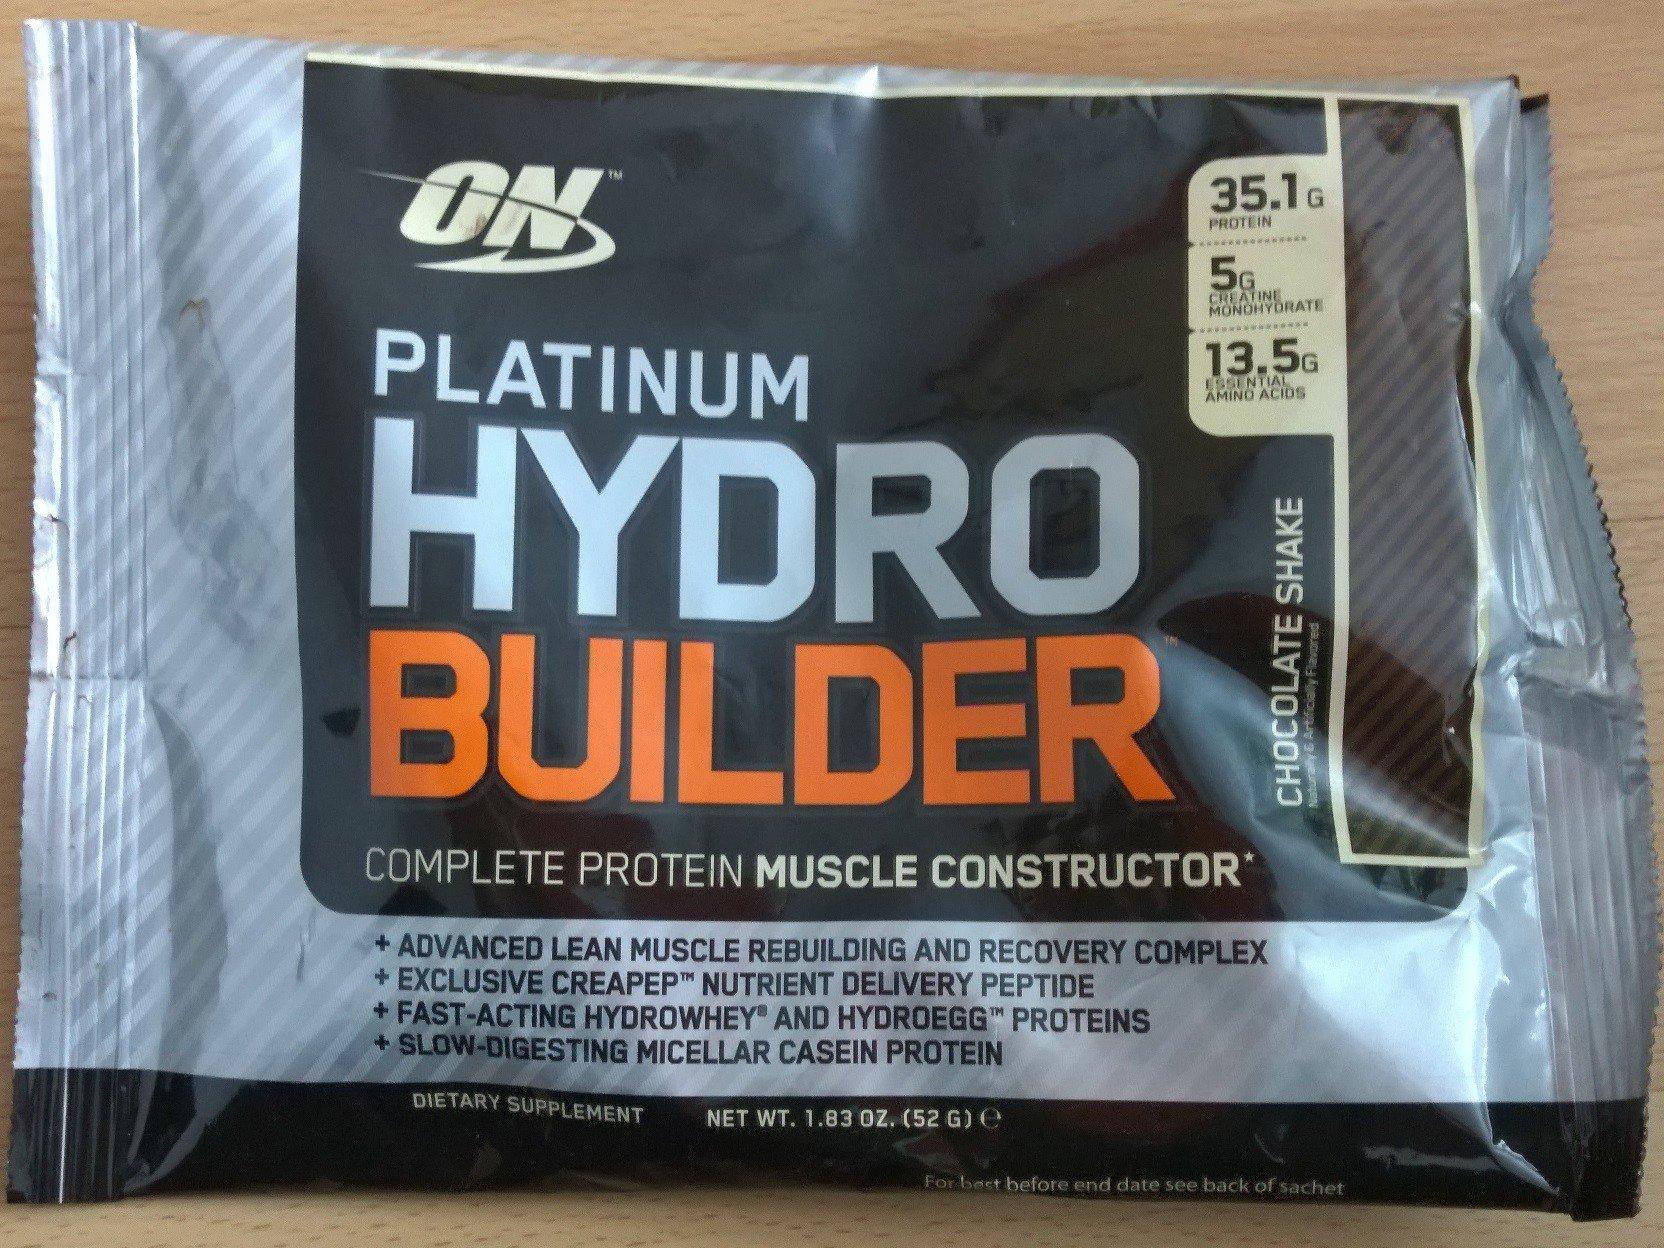 Platinum Hydro Builder test